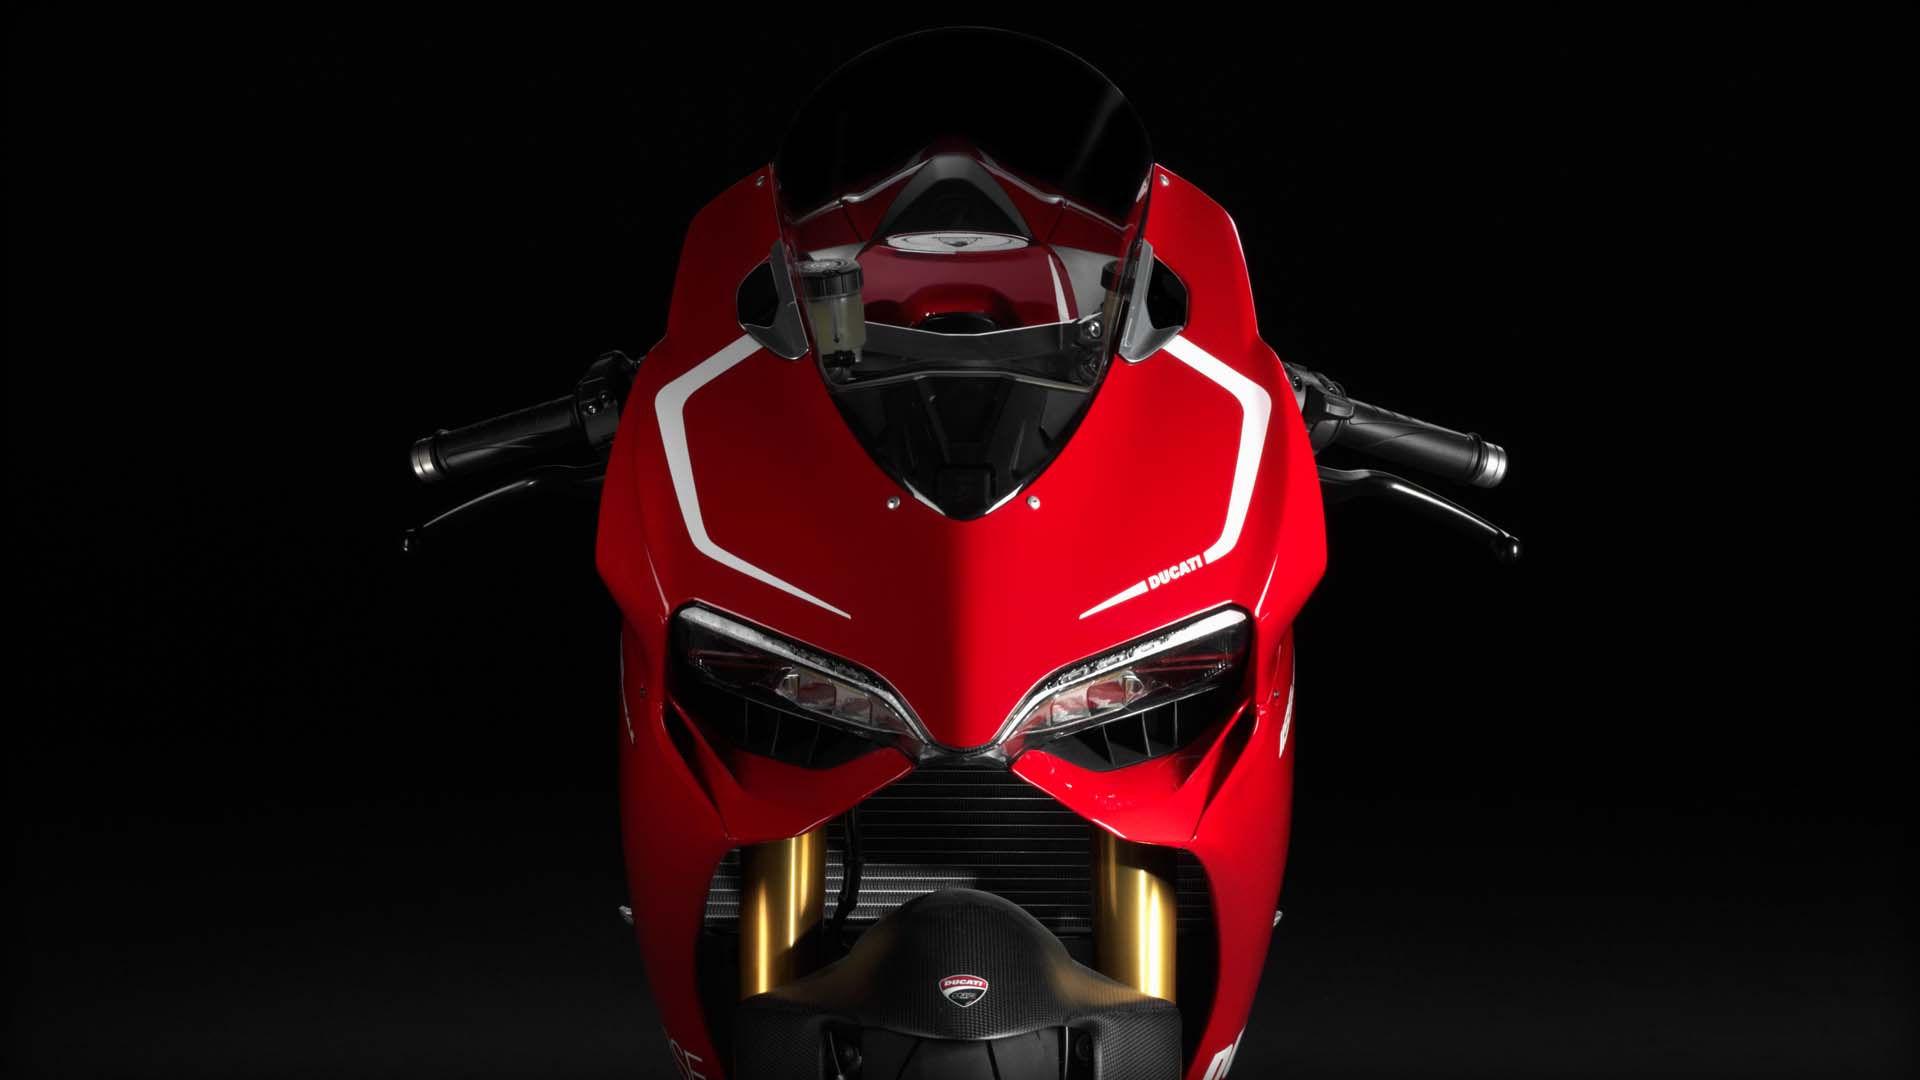 2014 Ducati  | Ducati 1199 Panigale R - Headlights